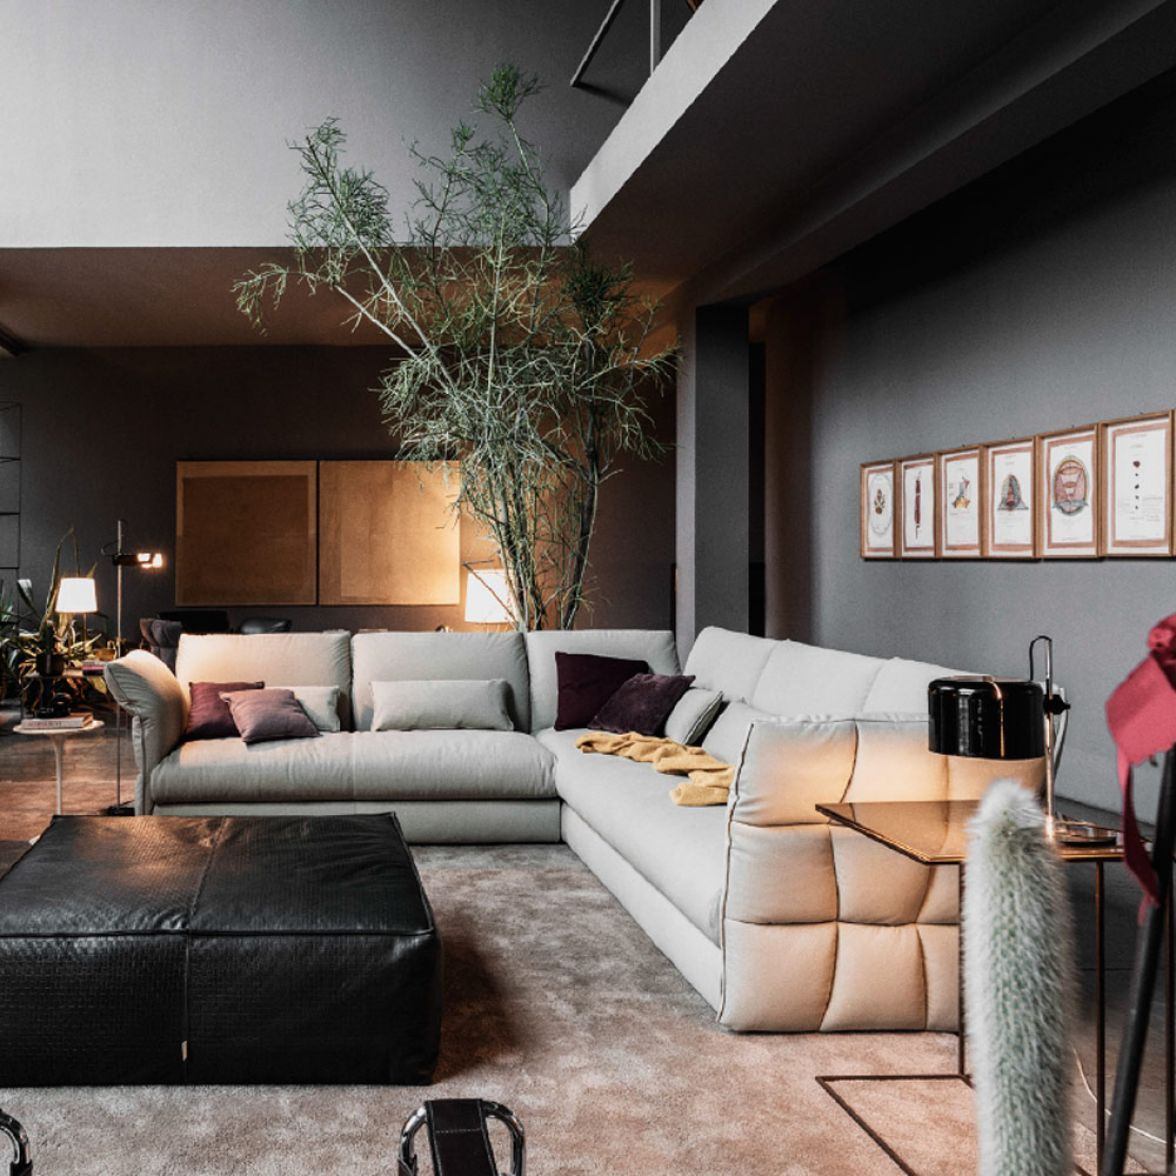 Eva Due modular sofa